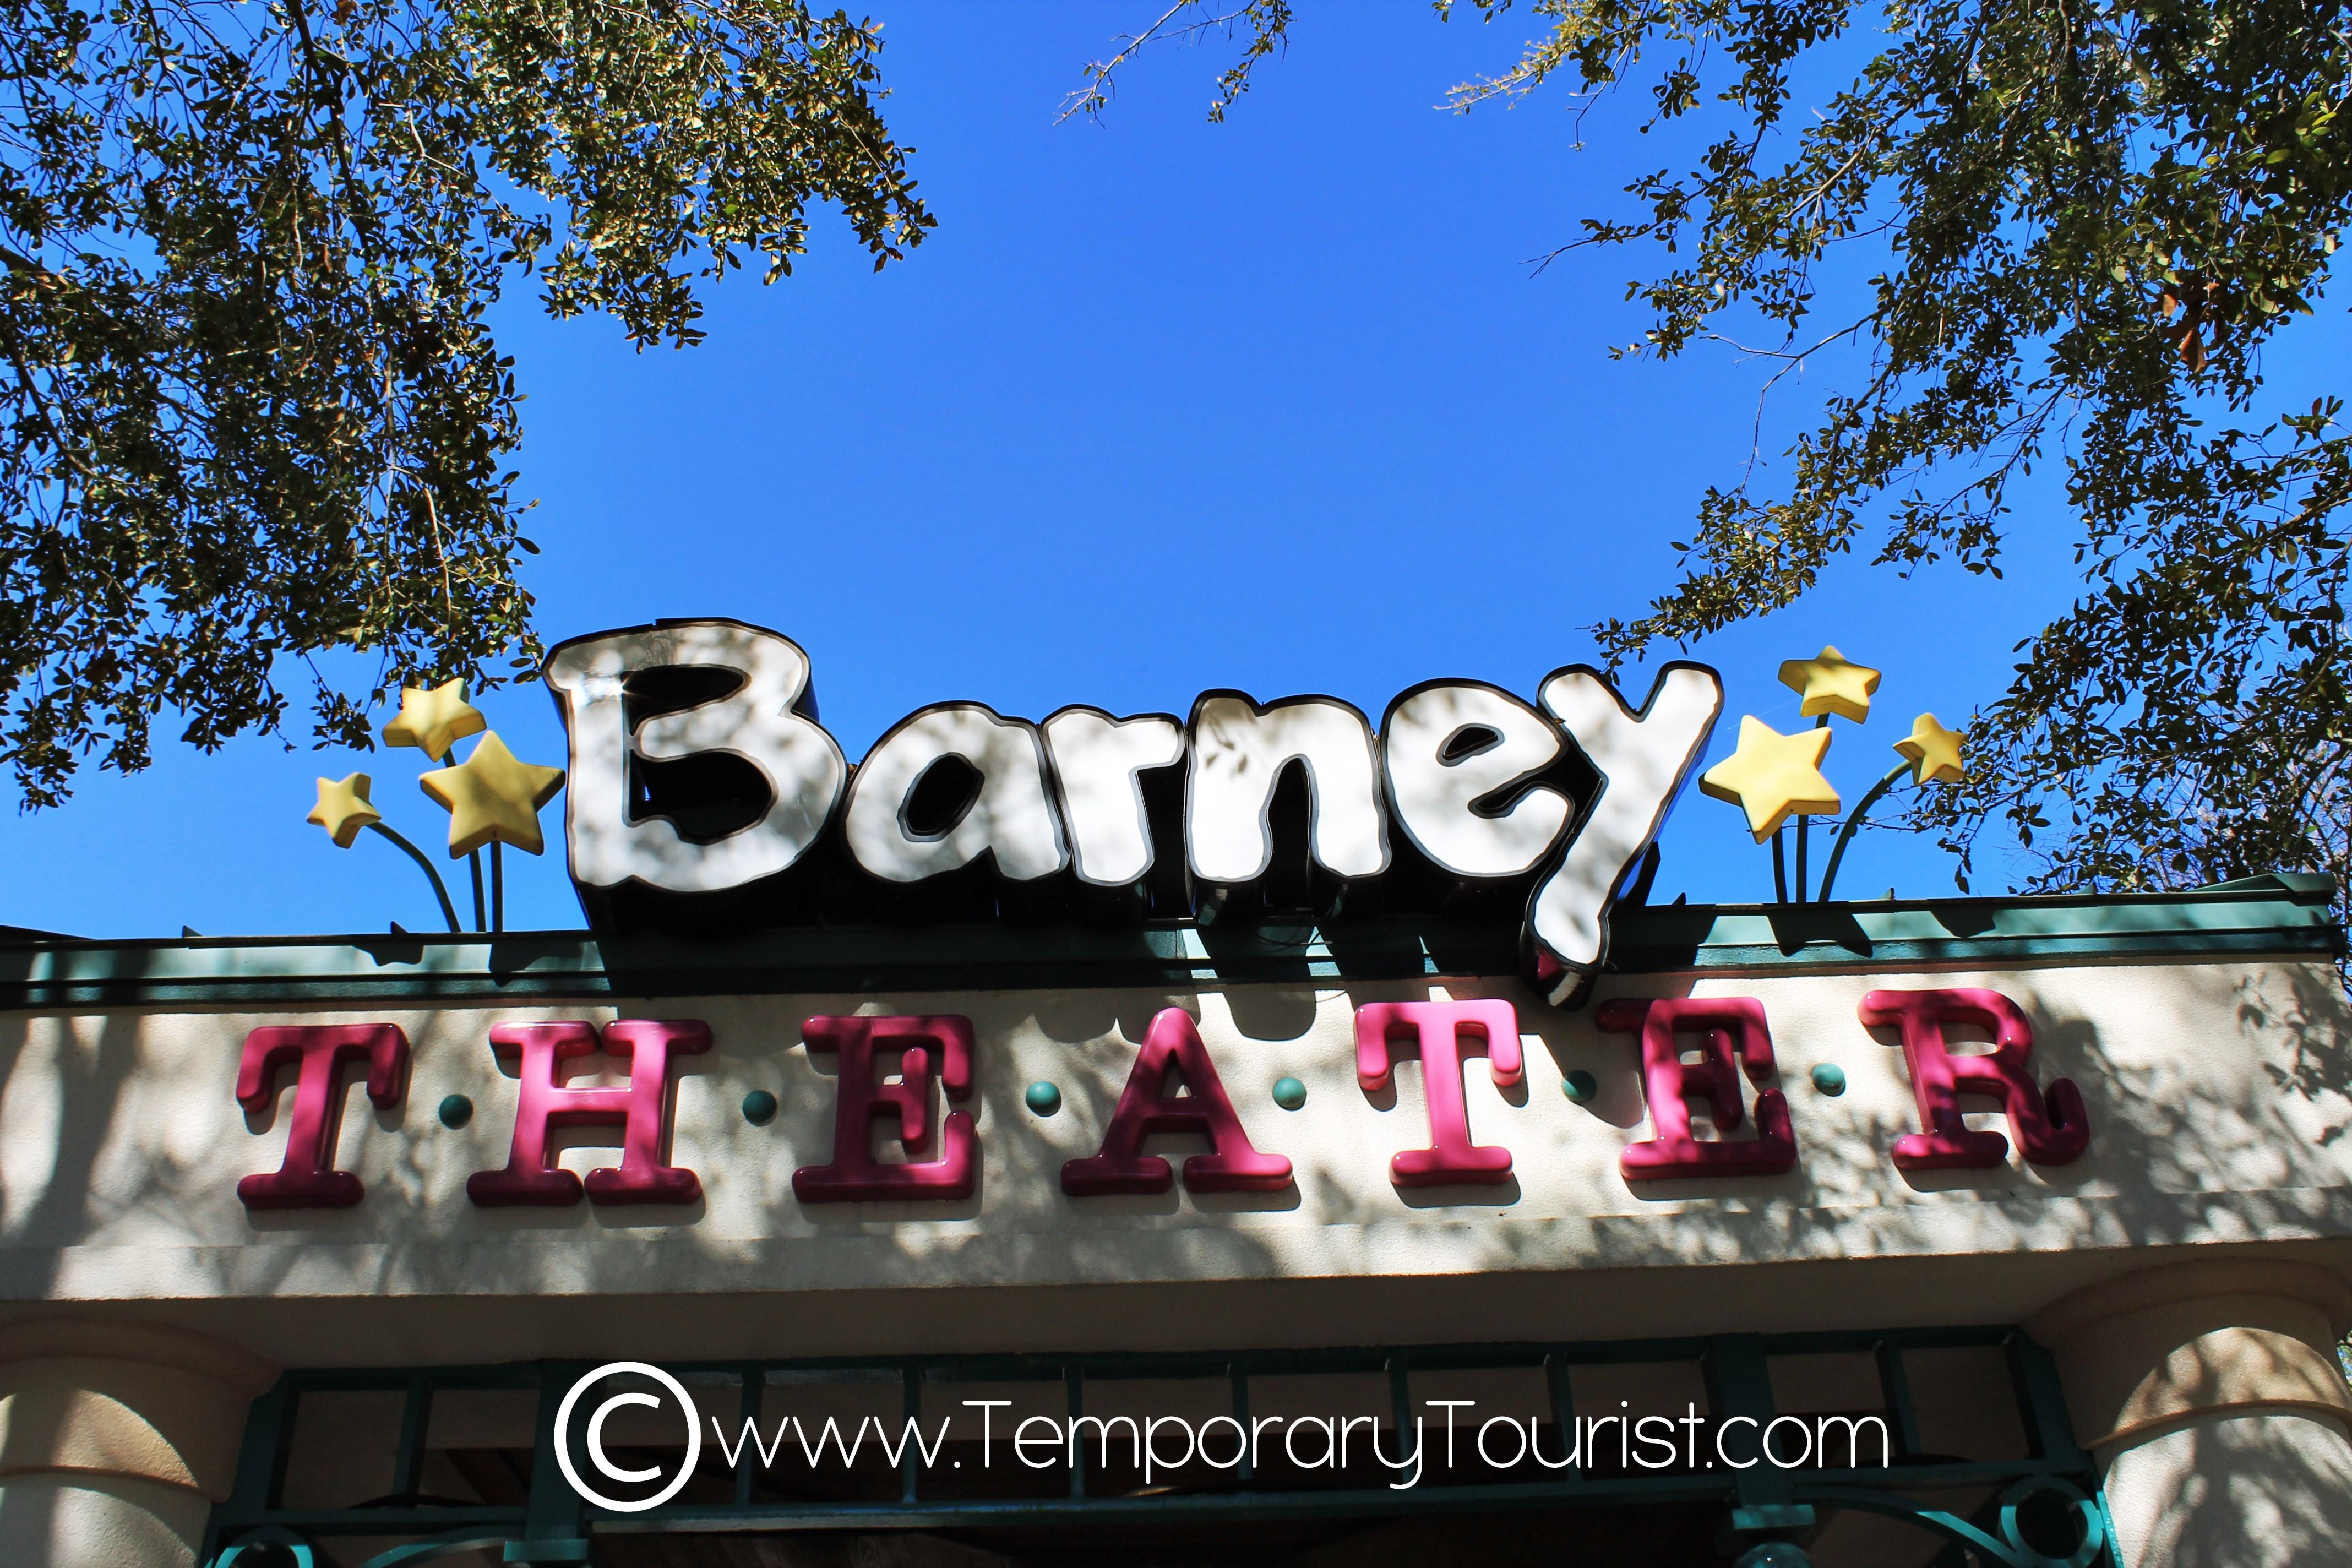 Barney at Universal Studios Orlando